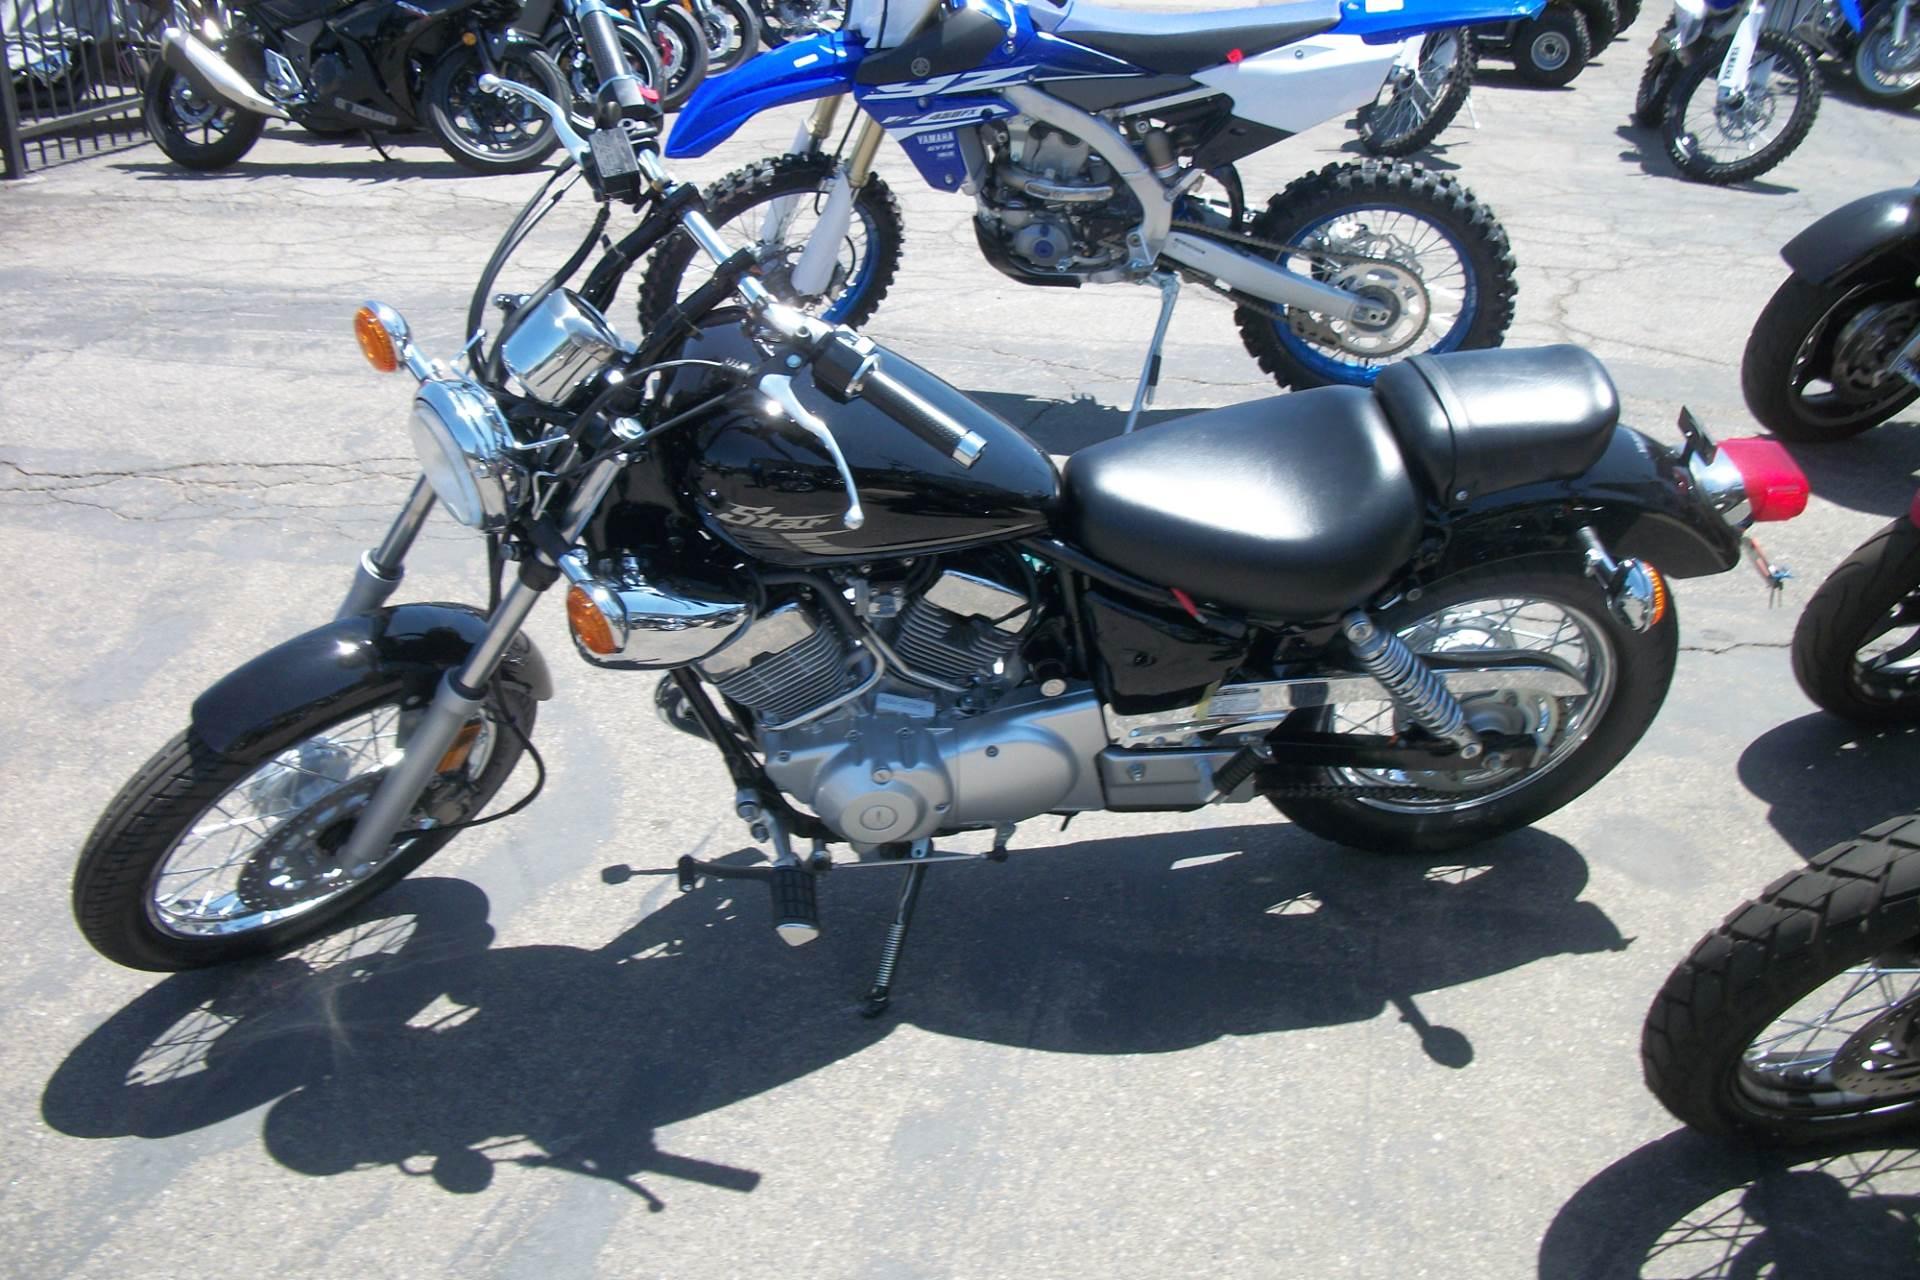 New 2018 Yamaha V Star 250 Motorcycles In Simi Valley Ca